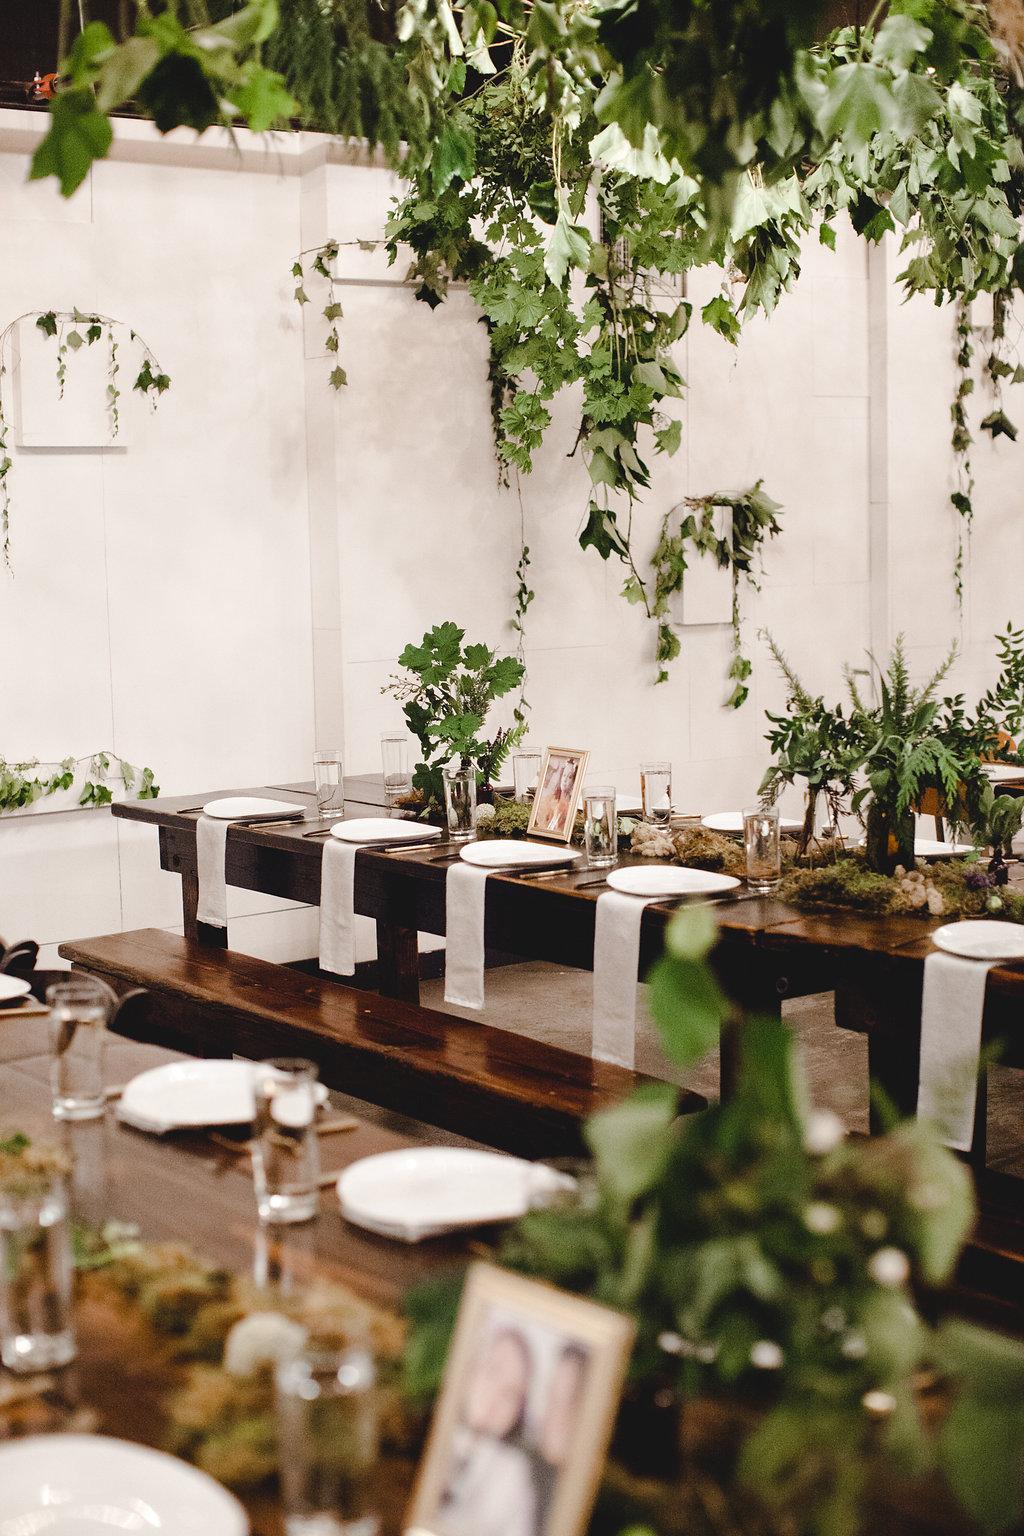 portland-wedding-venue-2.jpg